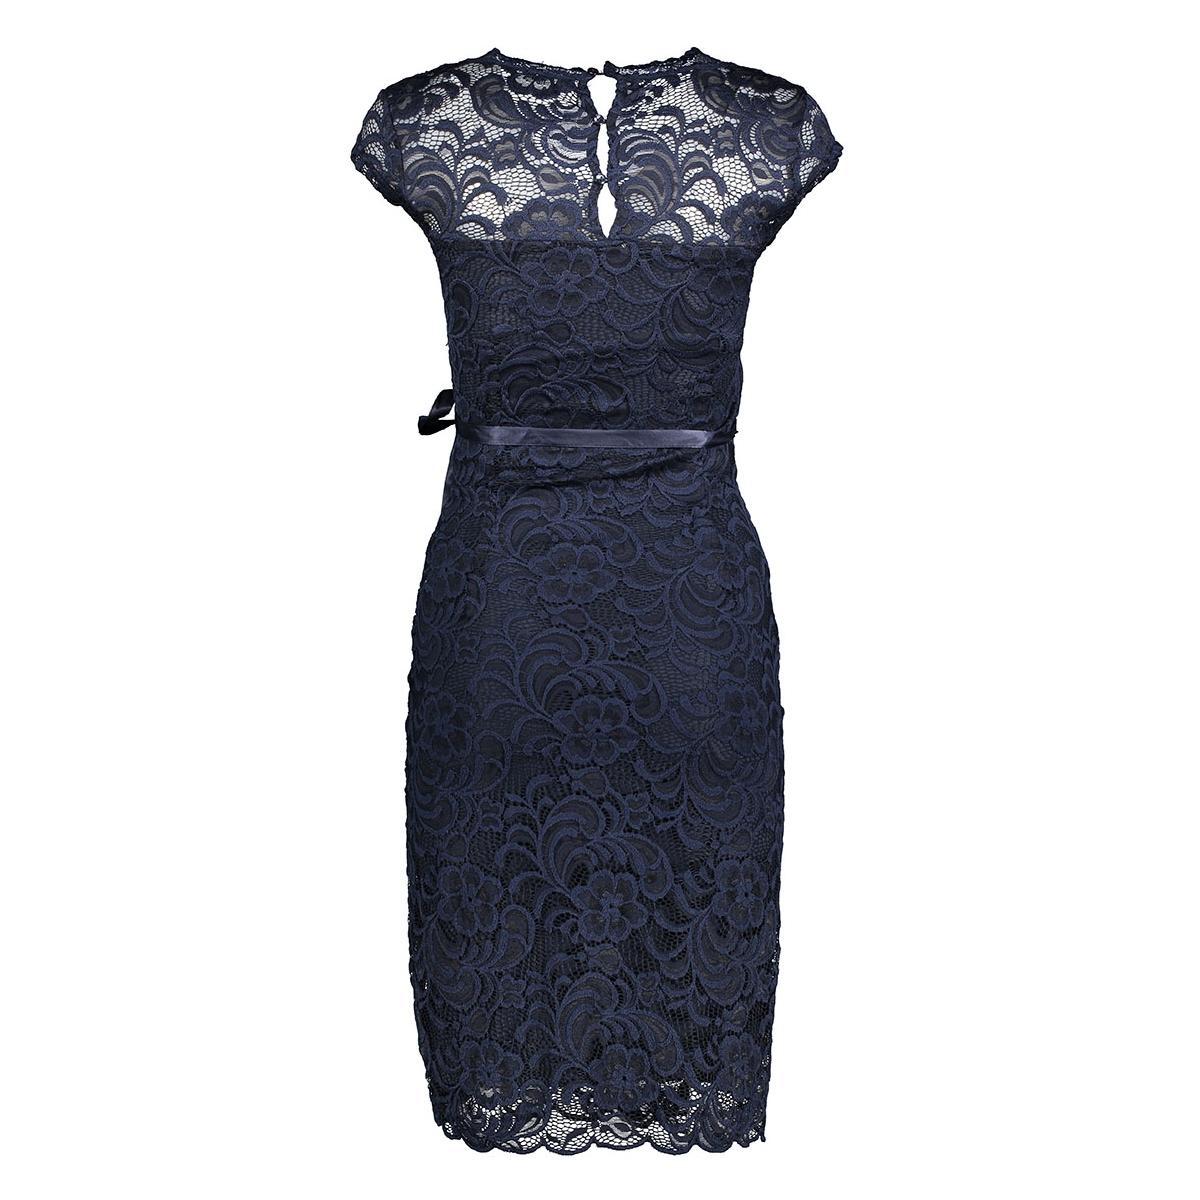 mlnewmivana cap jersey dress 20006241 mama-licious positie jurk navy blazer